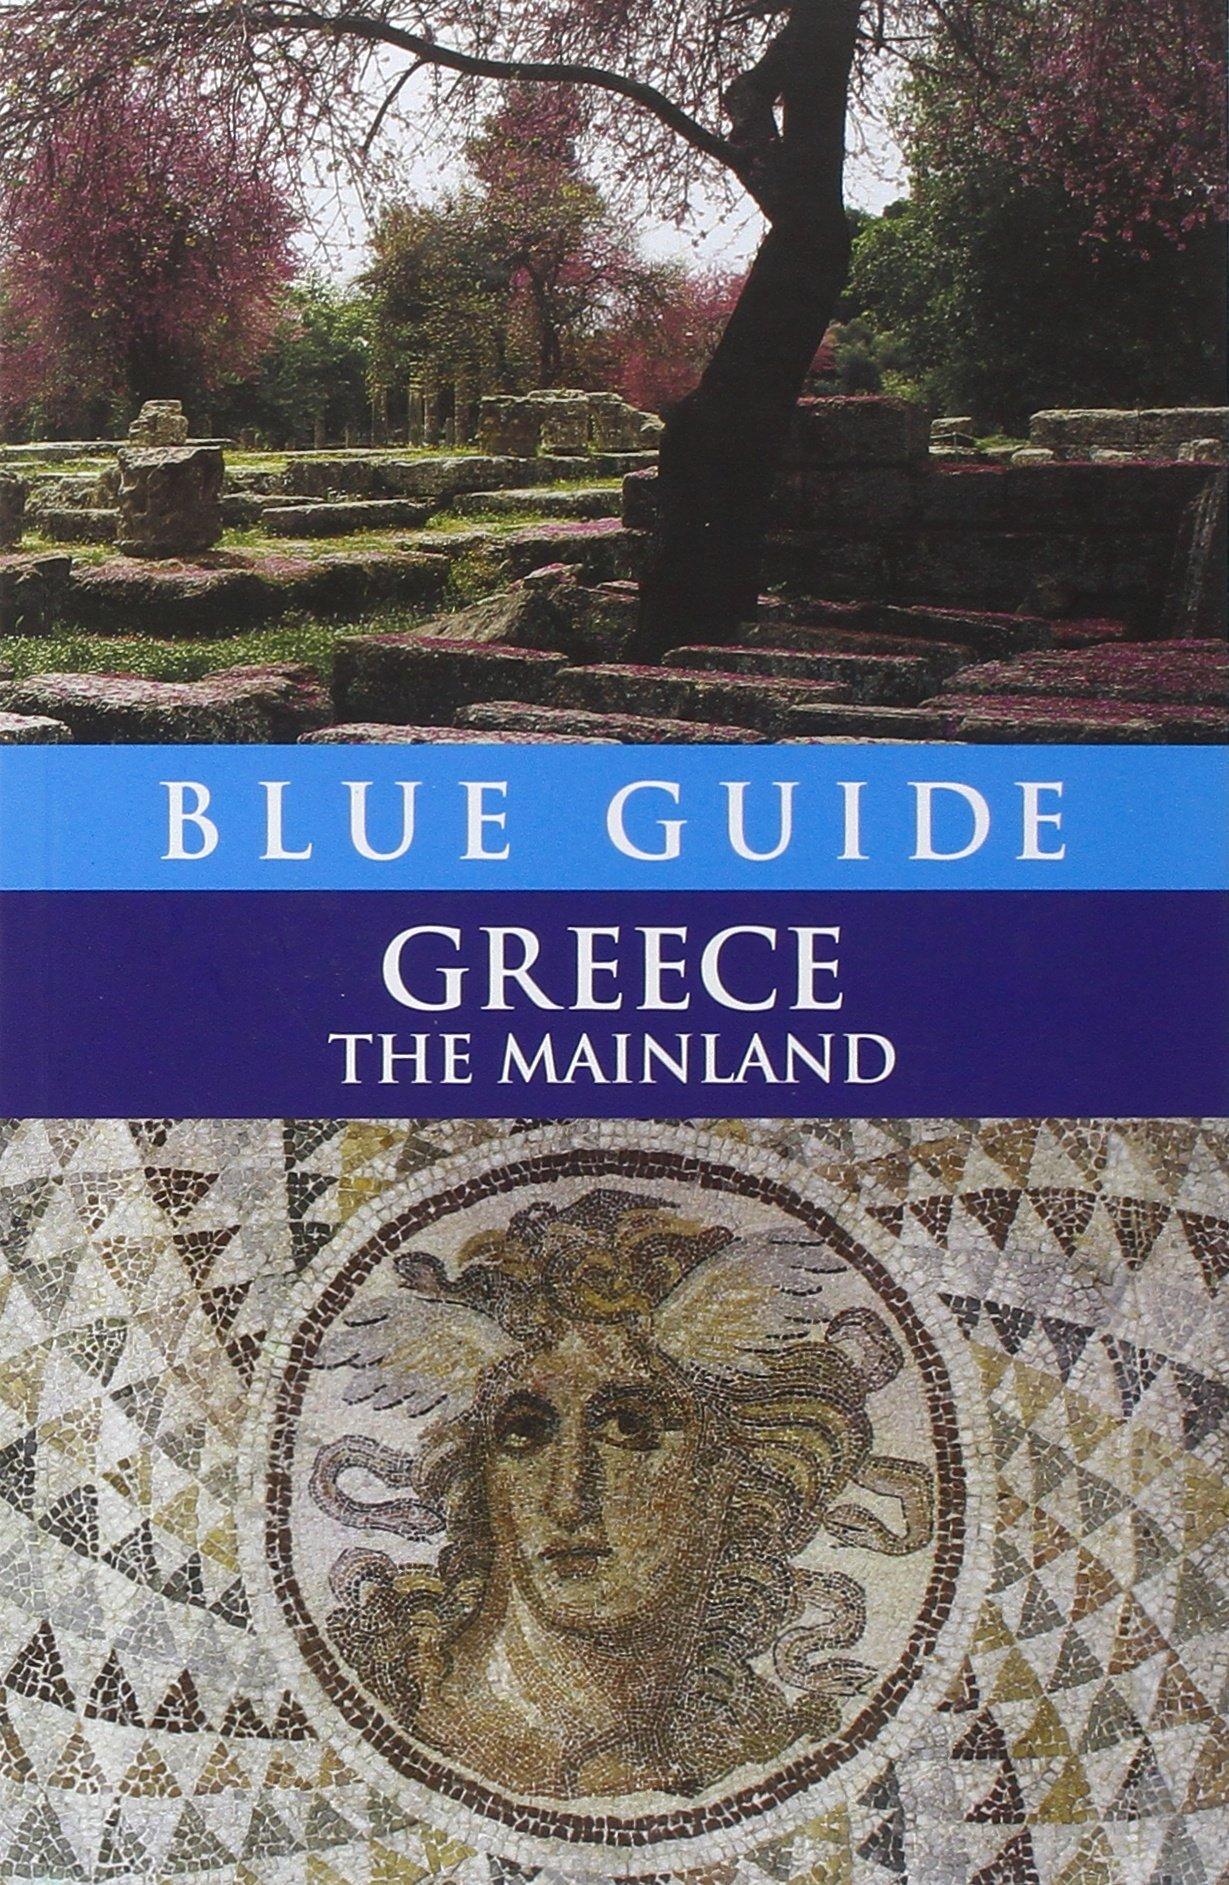 BLUE GUIDE GREECE PDF DOWNLOAD